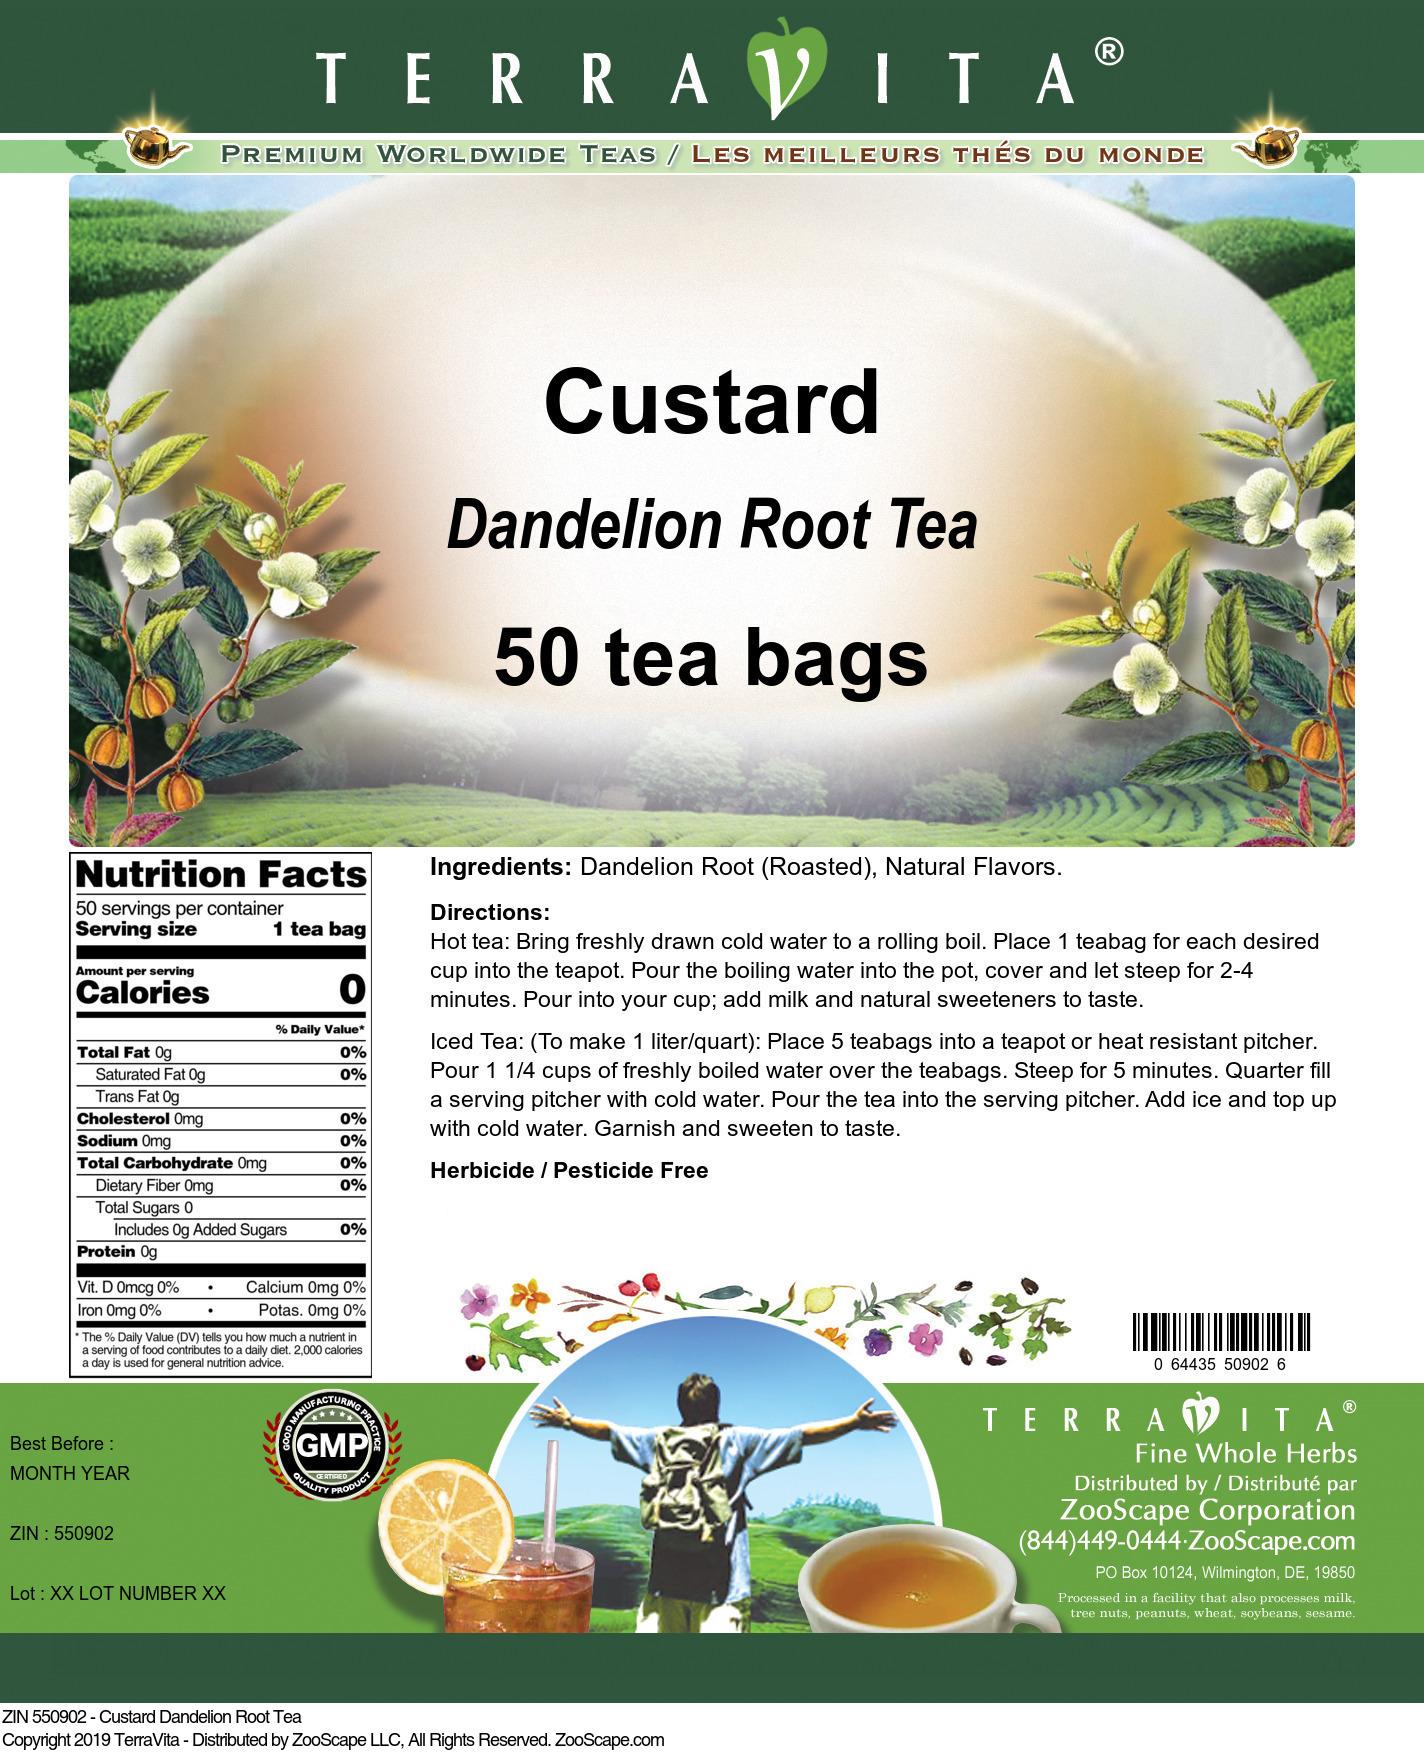 Custard Dandelion Root Tea